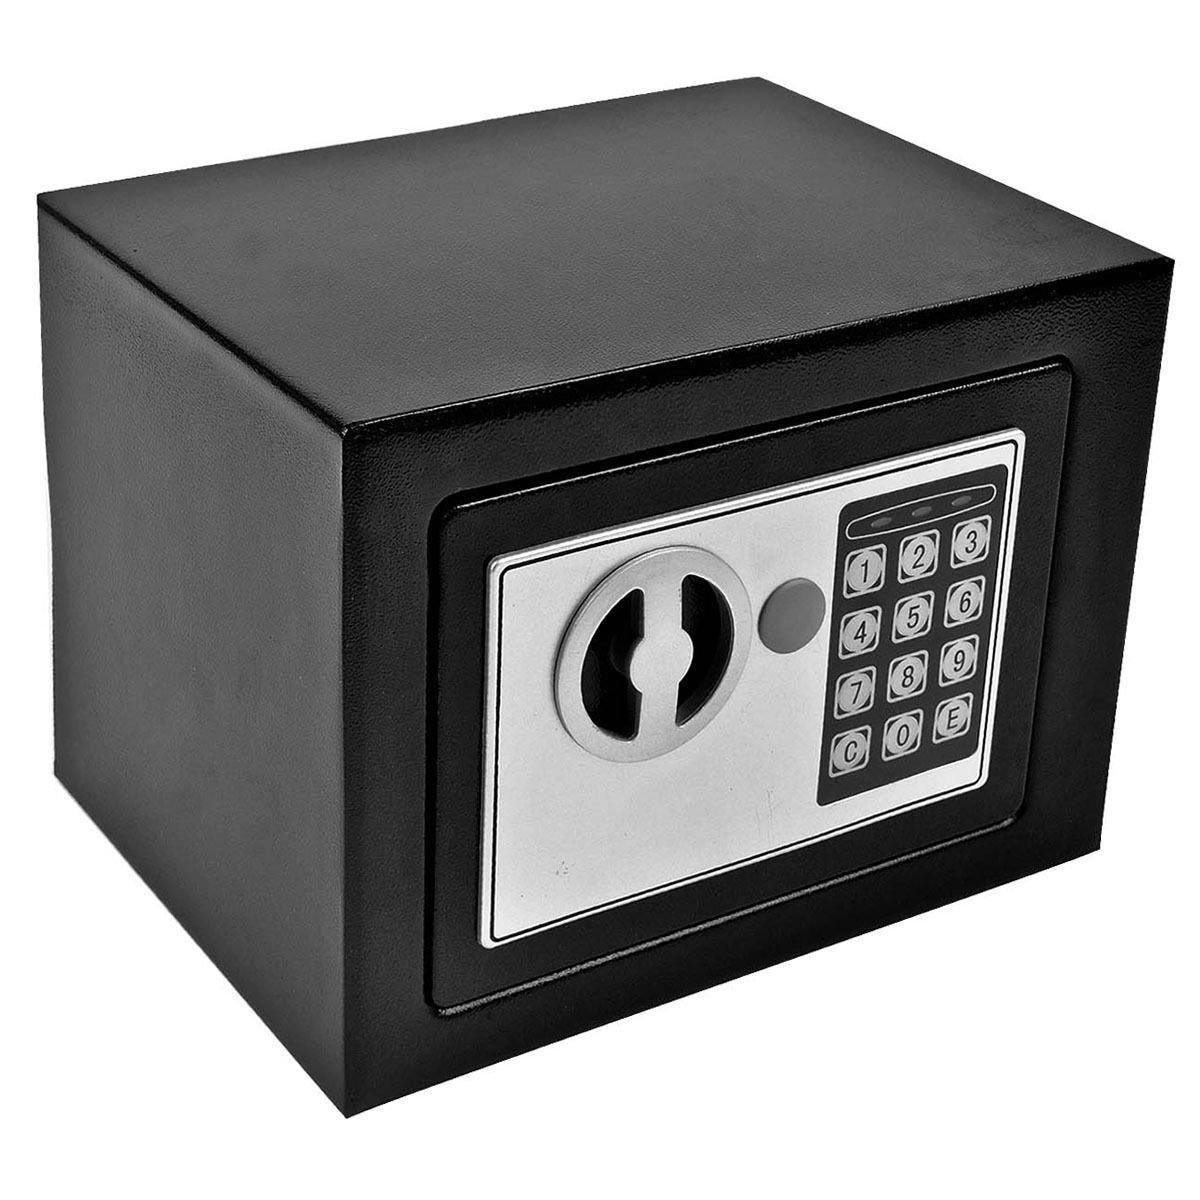 Giantex Durable Digital Electronic Safe Box Keypad Lock Home Office Hotel Gun (Black) by Giantex